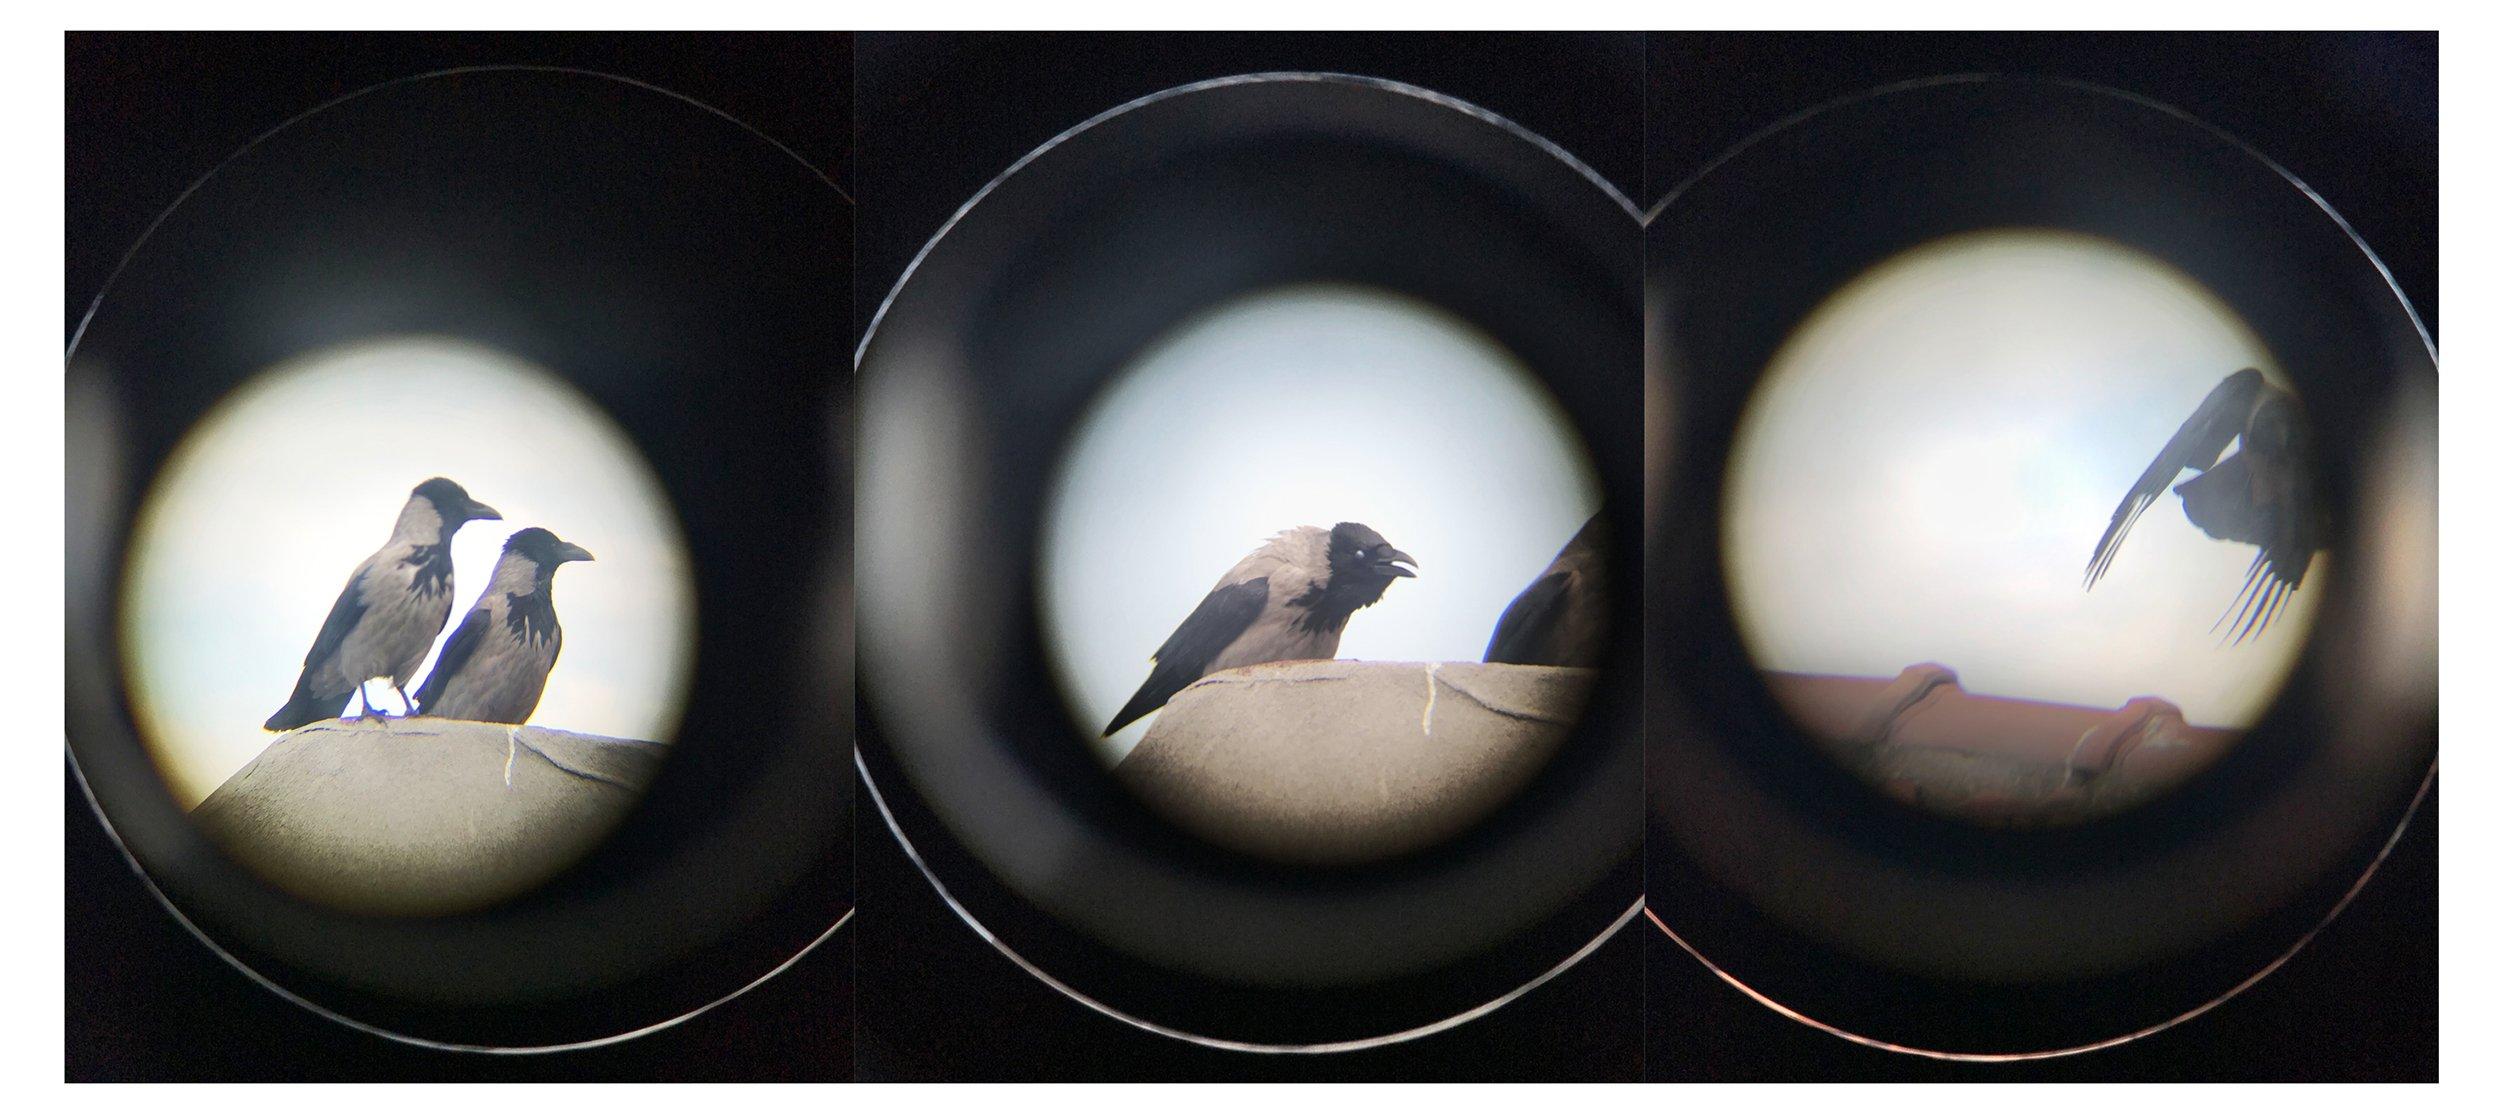 Yusuf Sevinçli, 'Crows,' May 2020, digital photograph. (Photo Courtesy of Istanbul Modern)